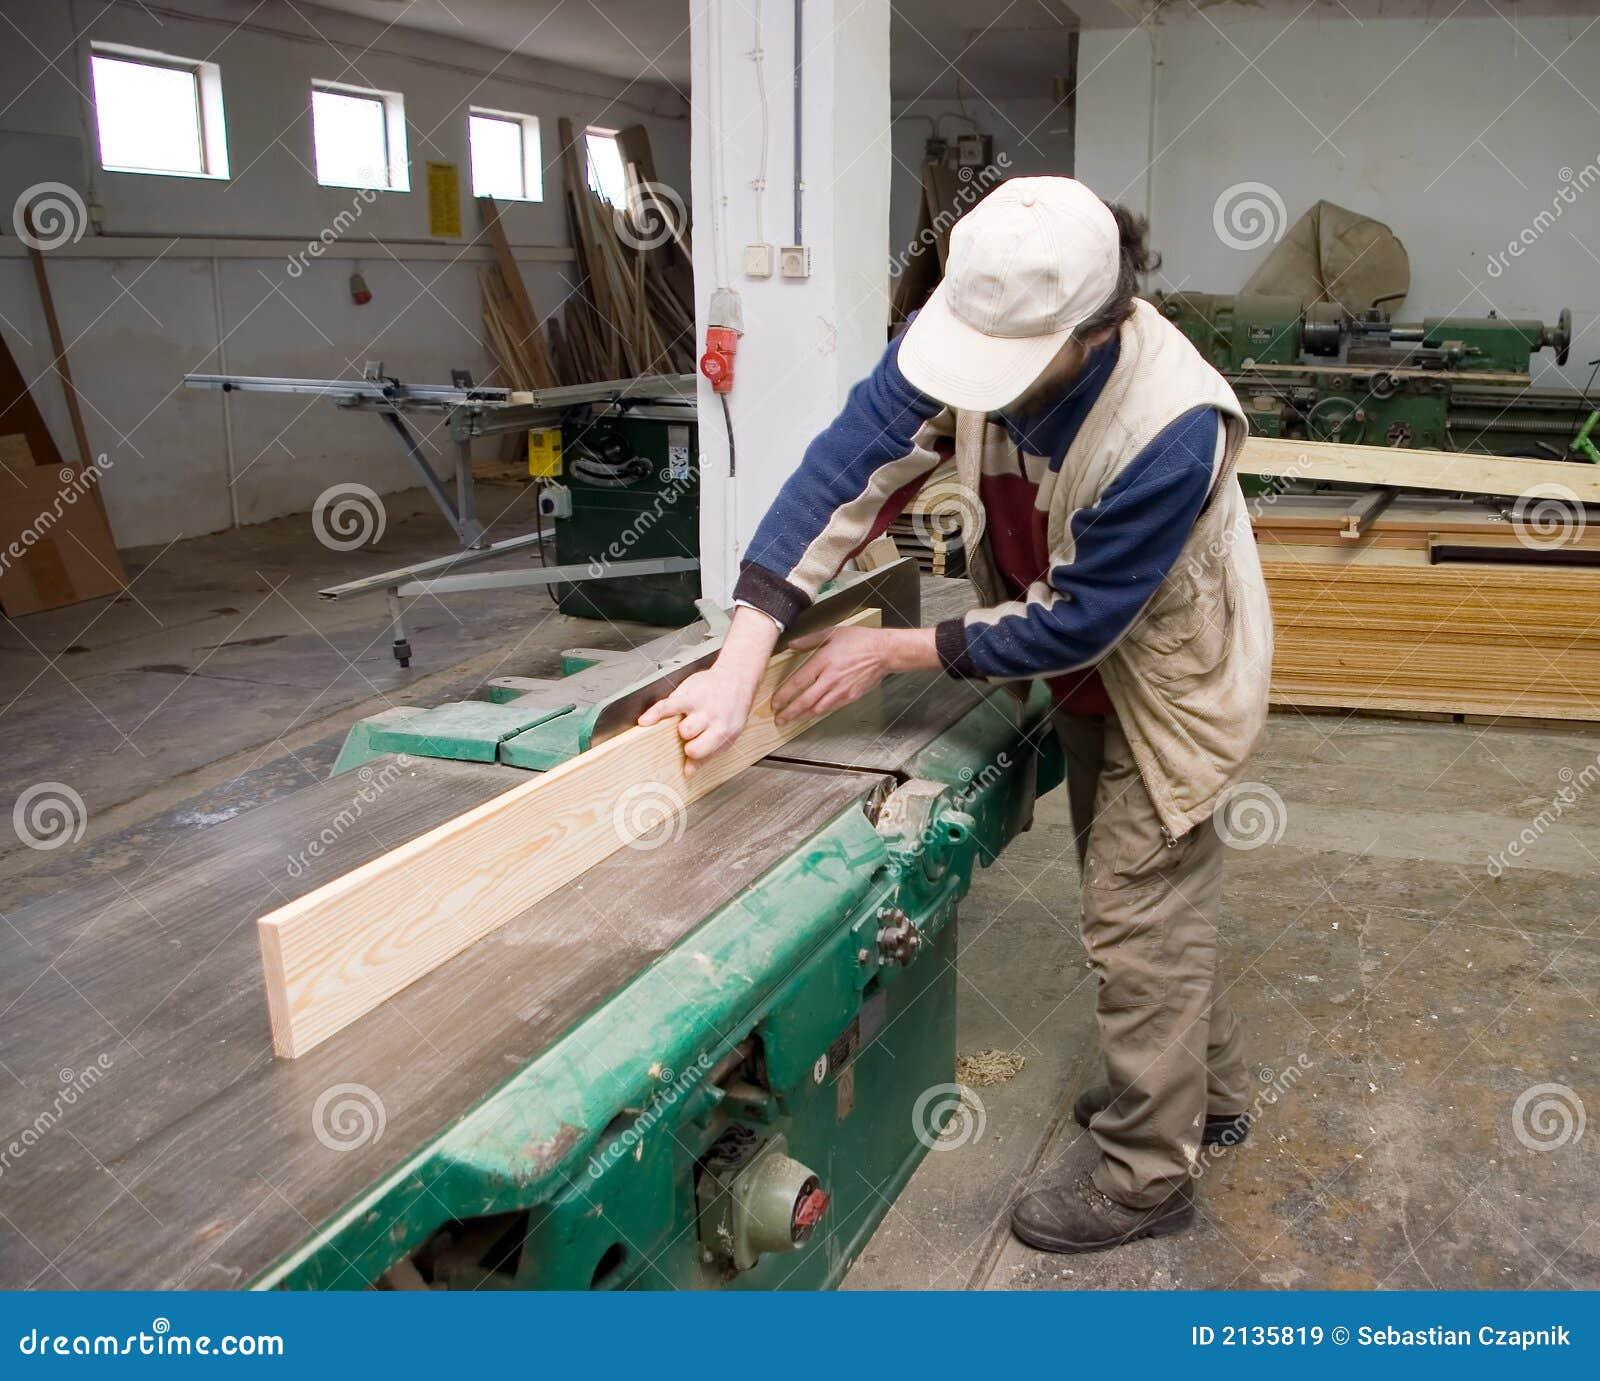 Carpenter at work.